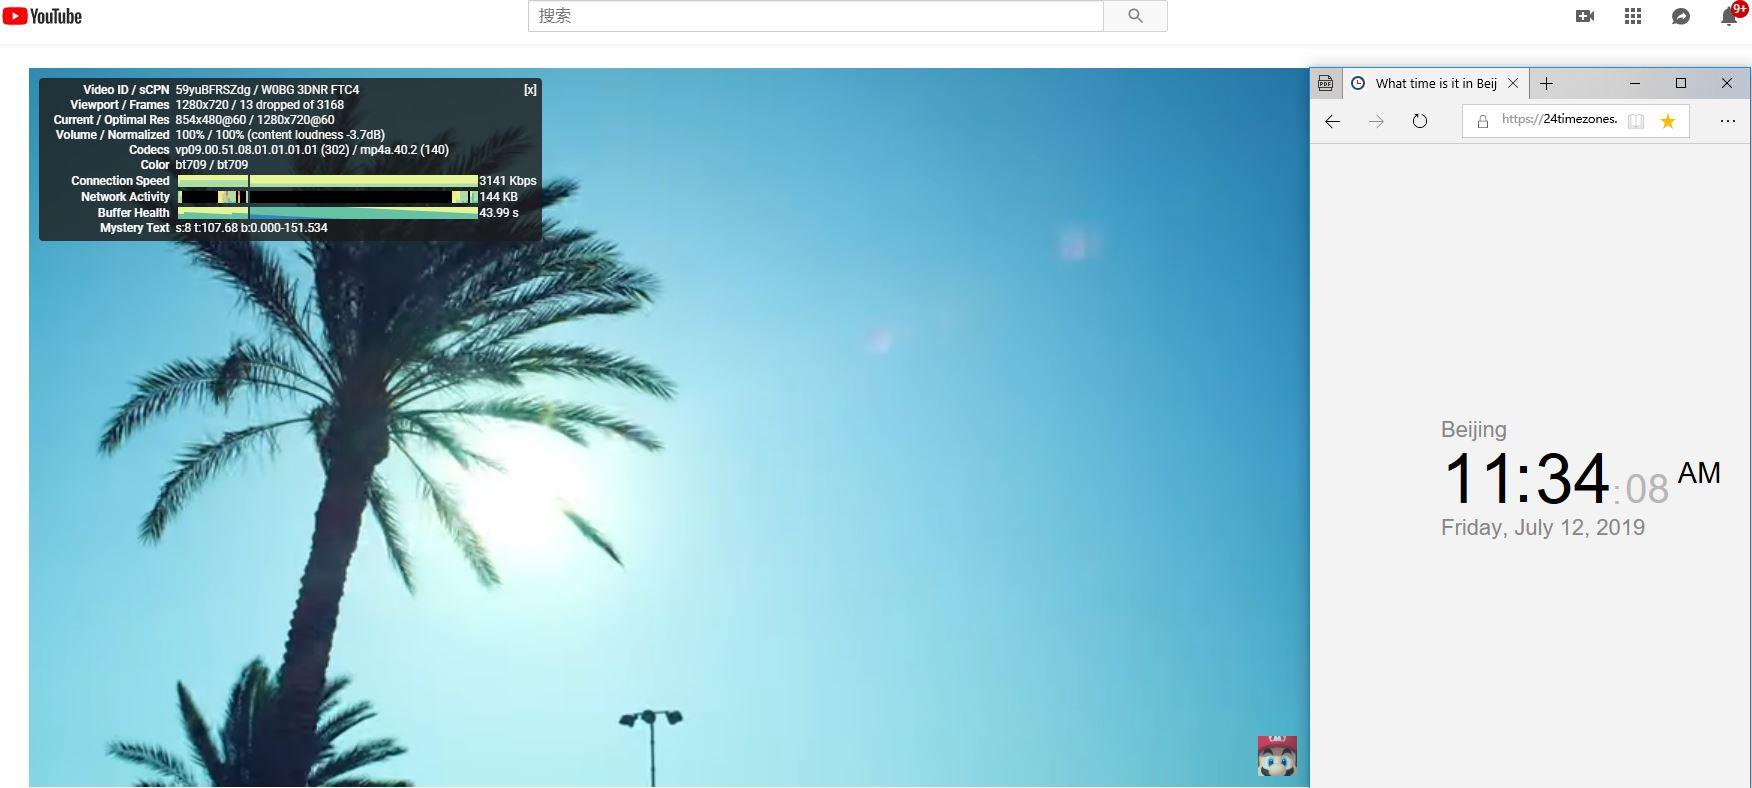 windows nordvpn 法国331节点 中国翻墙-科学上网 YouTube测试-20190712